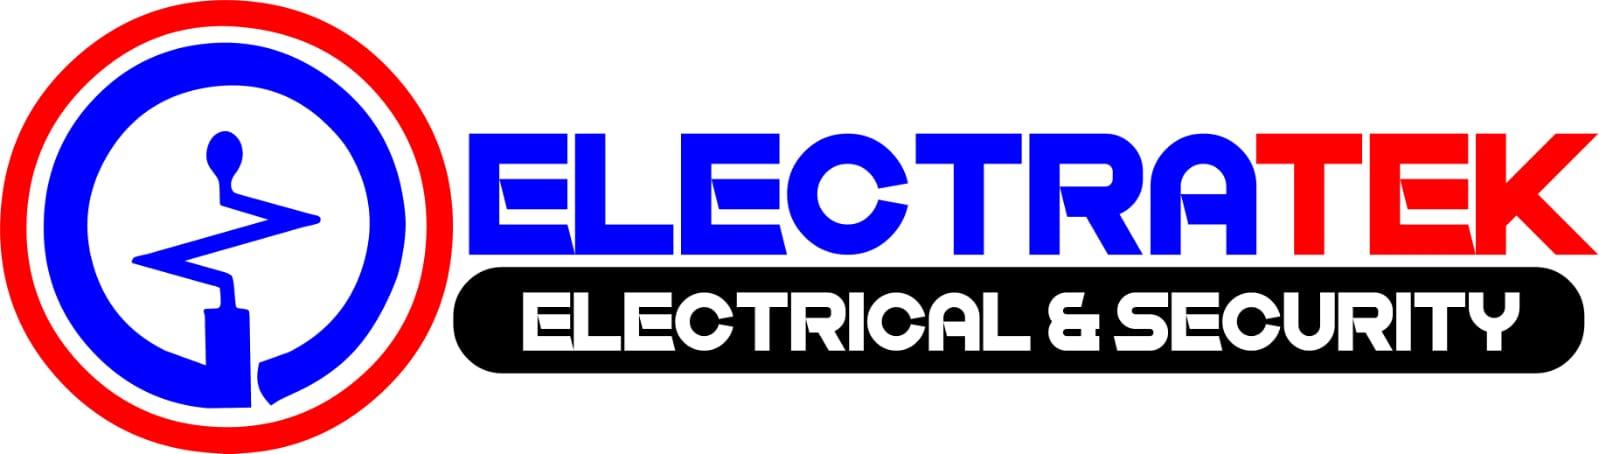 Electratek